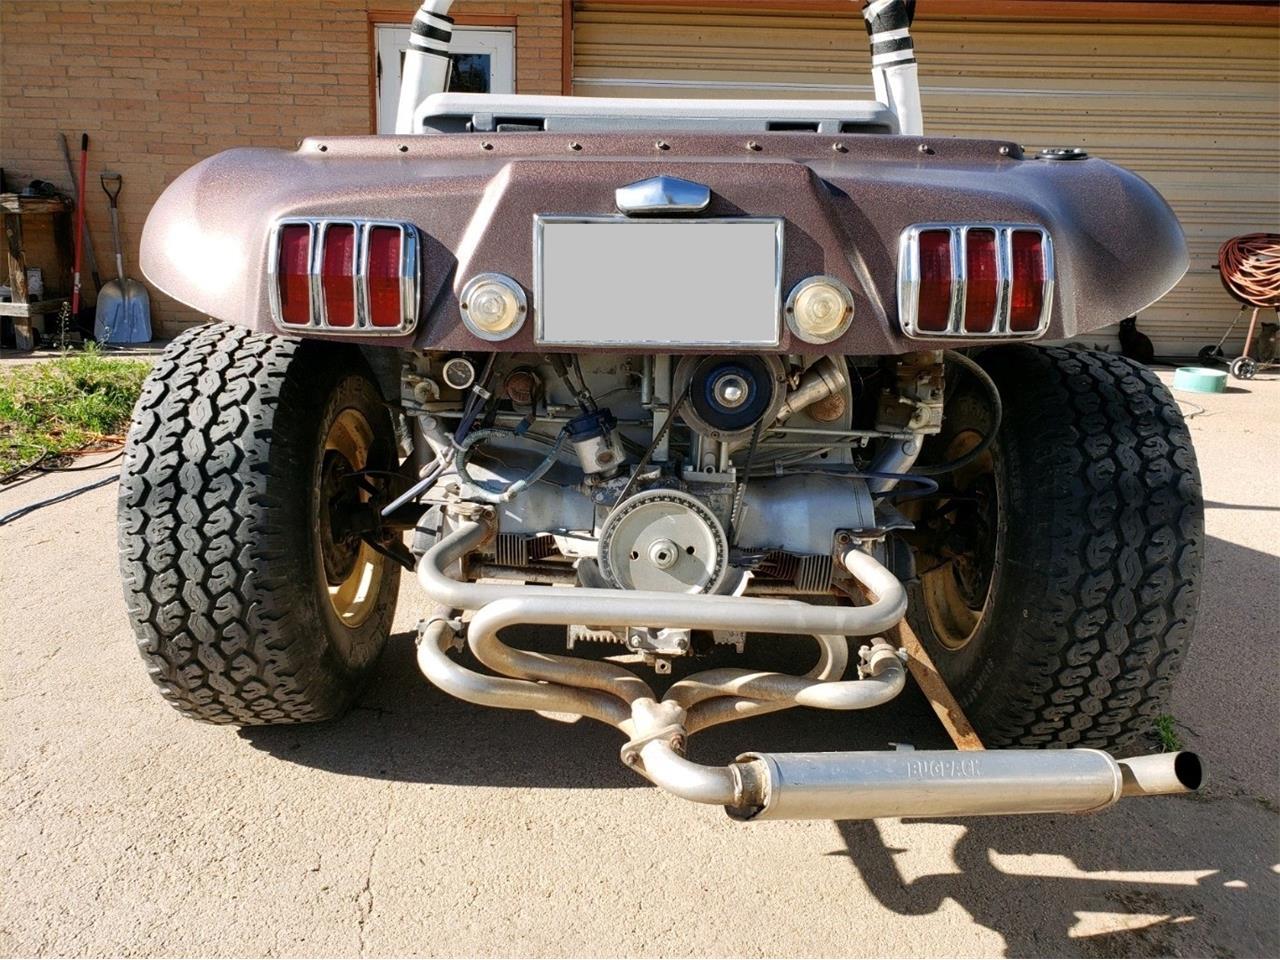 Large Picture of '75 Volkswagen Dune Buggy located in Garfield Kansas - $9,000.00 - PYAK